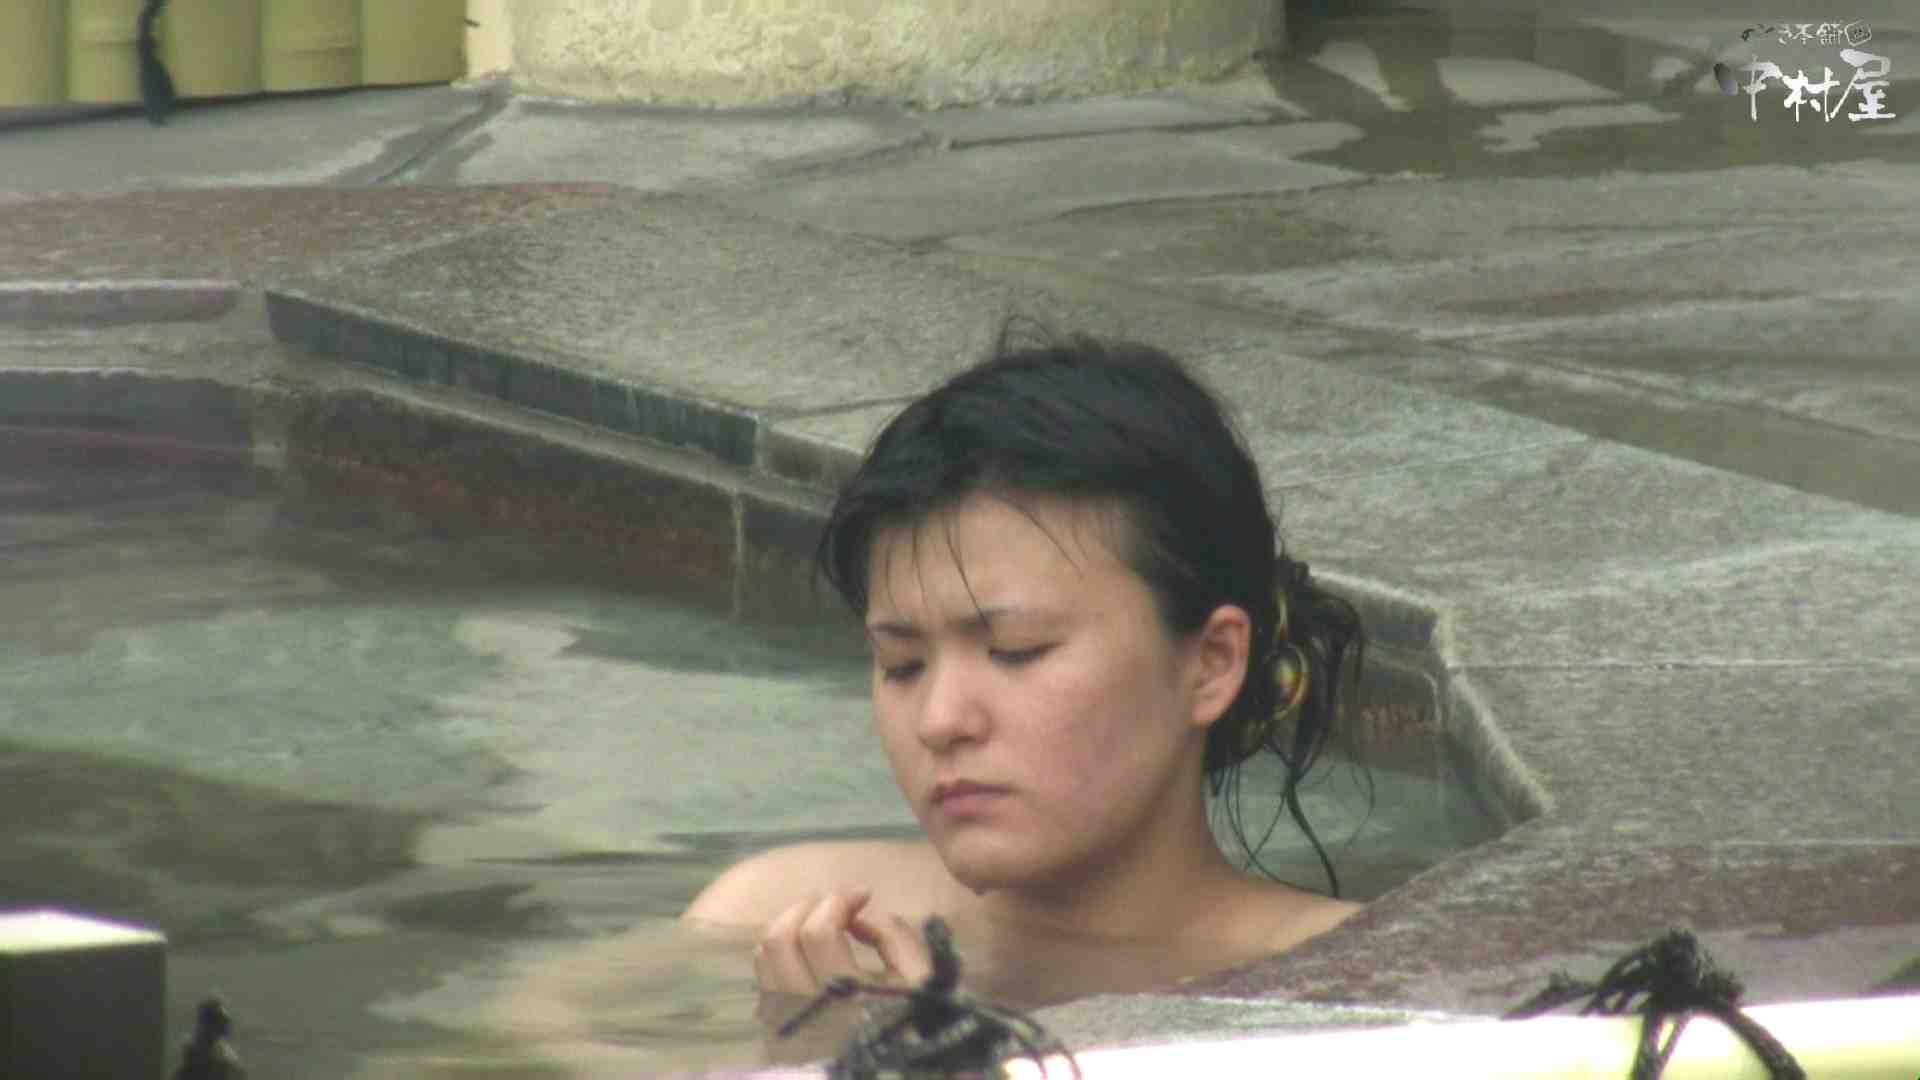 Aquaな露天風呂Vol.894 盗撮シリーズ | 露天風呂編  85PIX 55